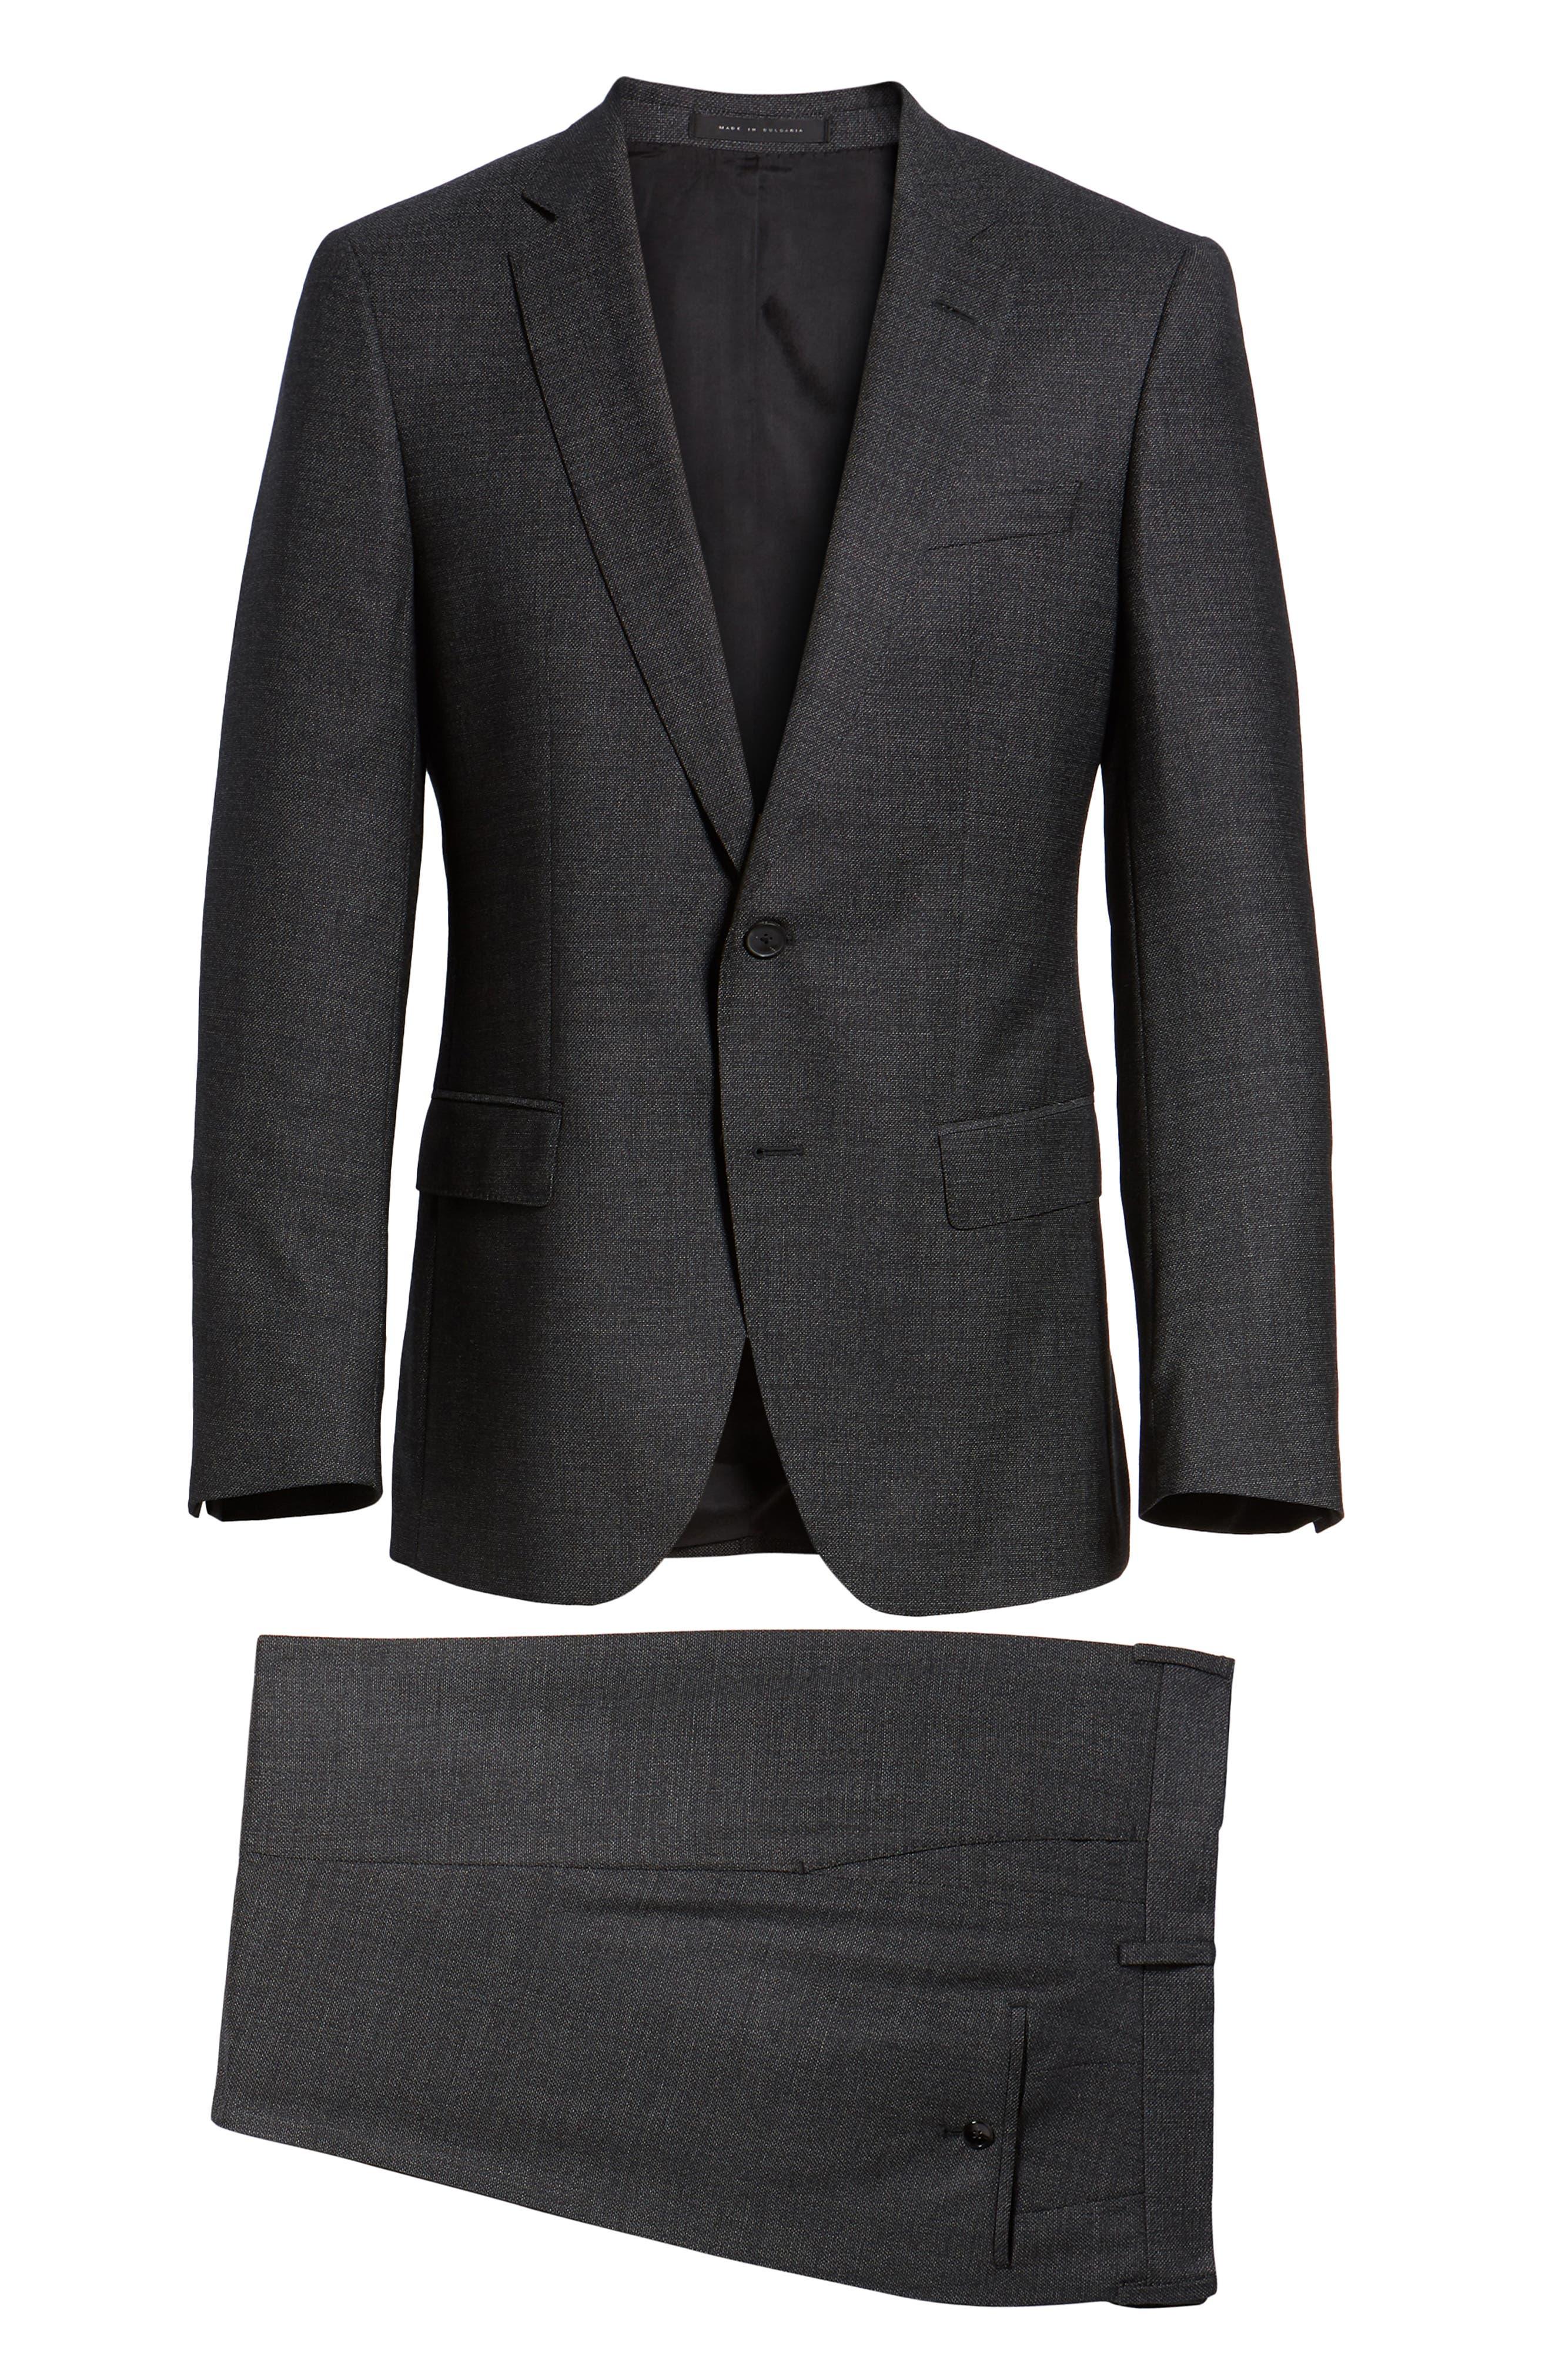 Huge/Genius Trim Fit Solid Wool Suit,                             Alternate thumbnail 8, color,                             BLACK